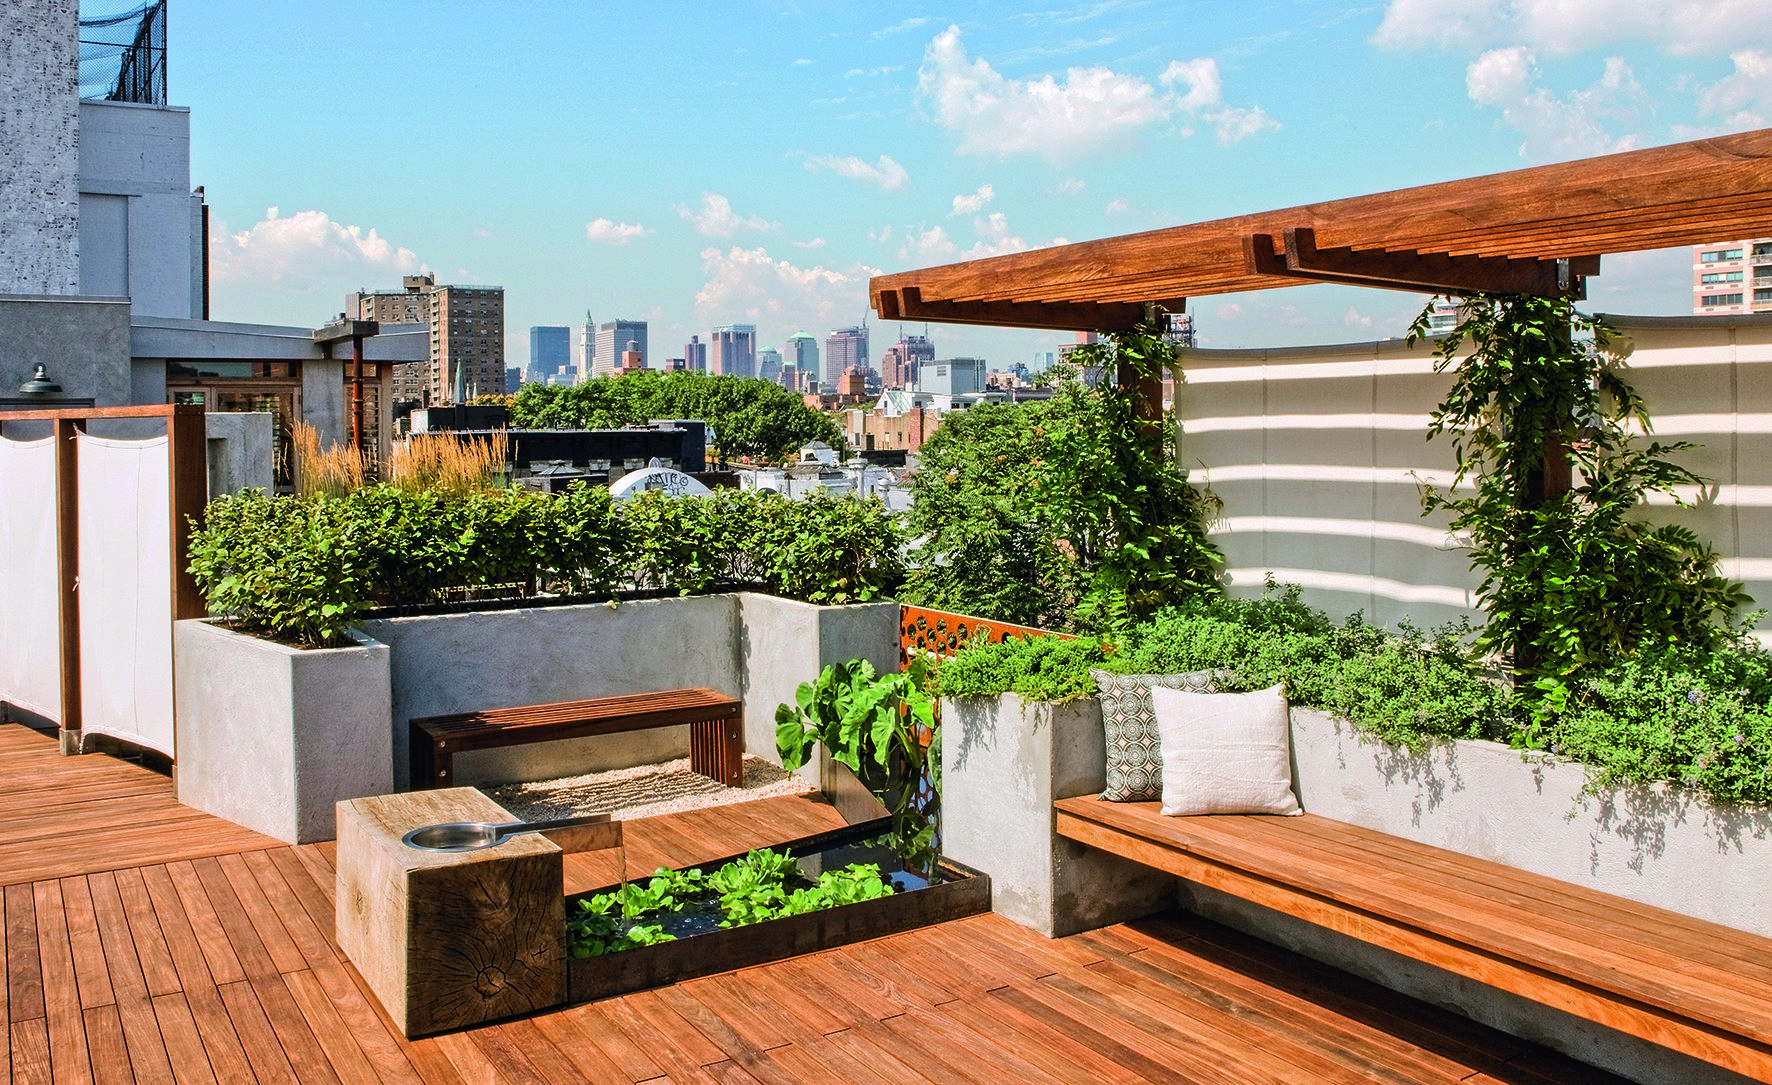 9 Remarkable Rooftop Garden Designs Around The World Roof Garden